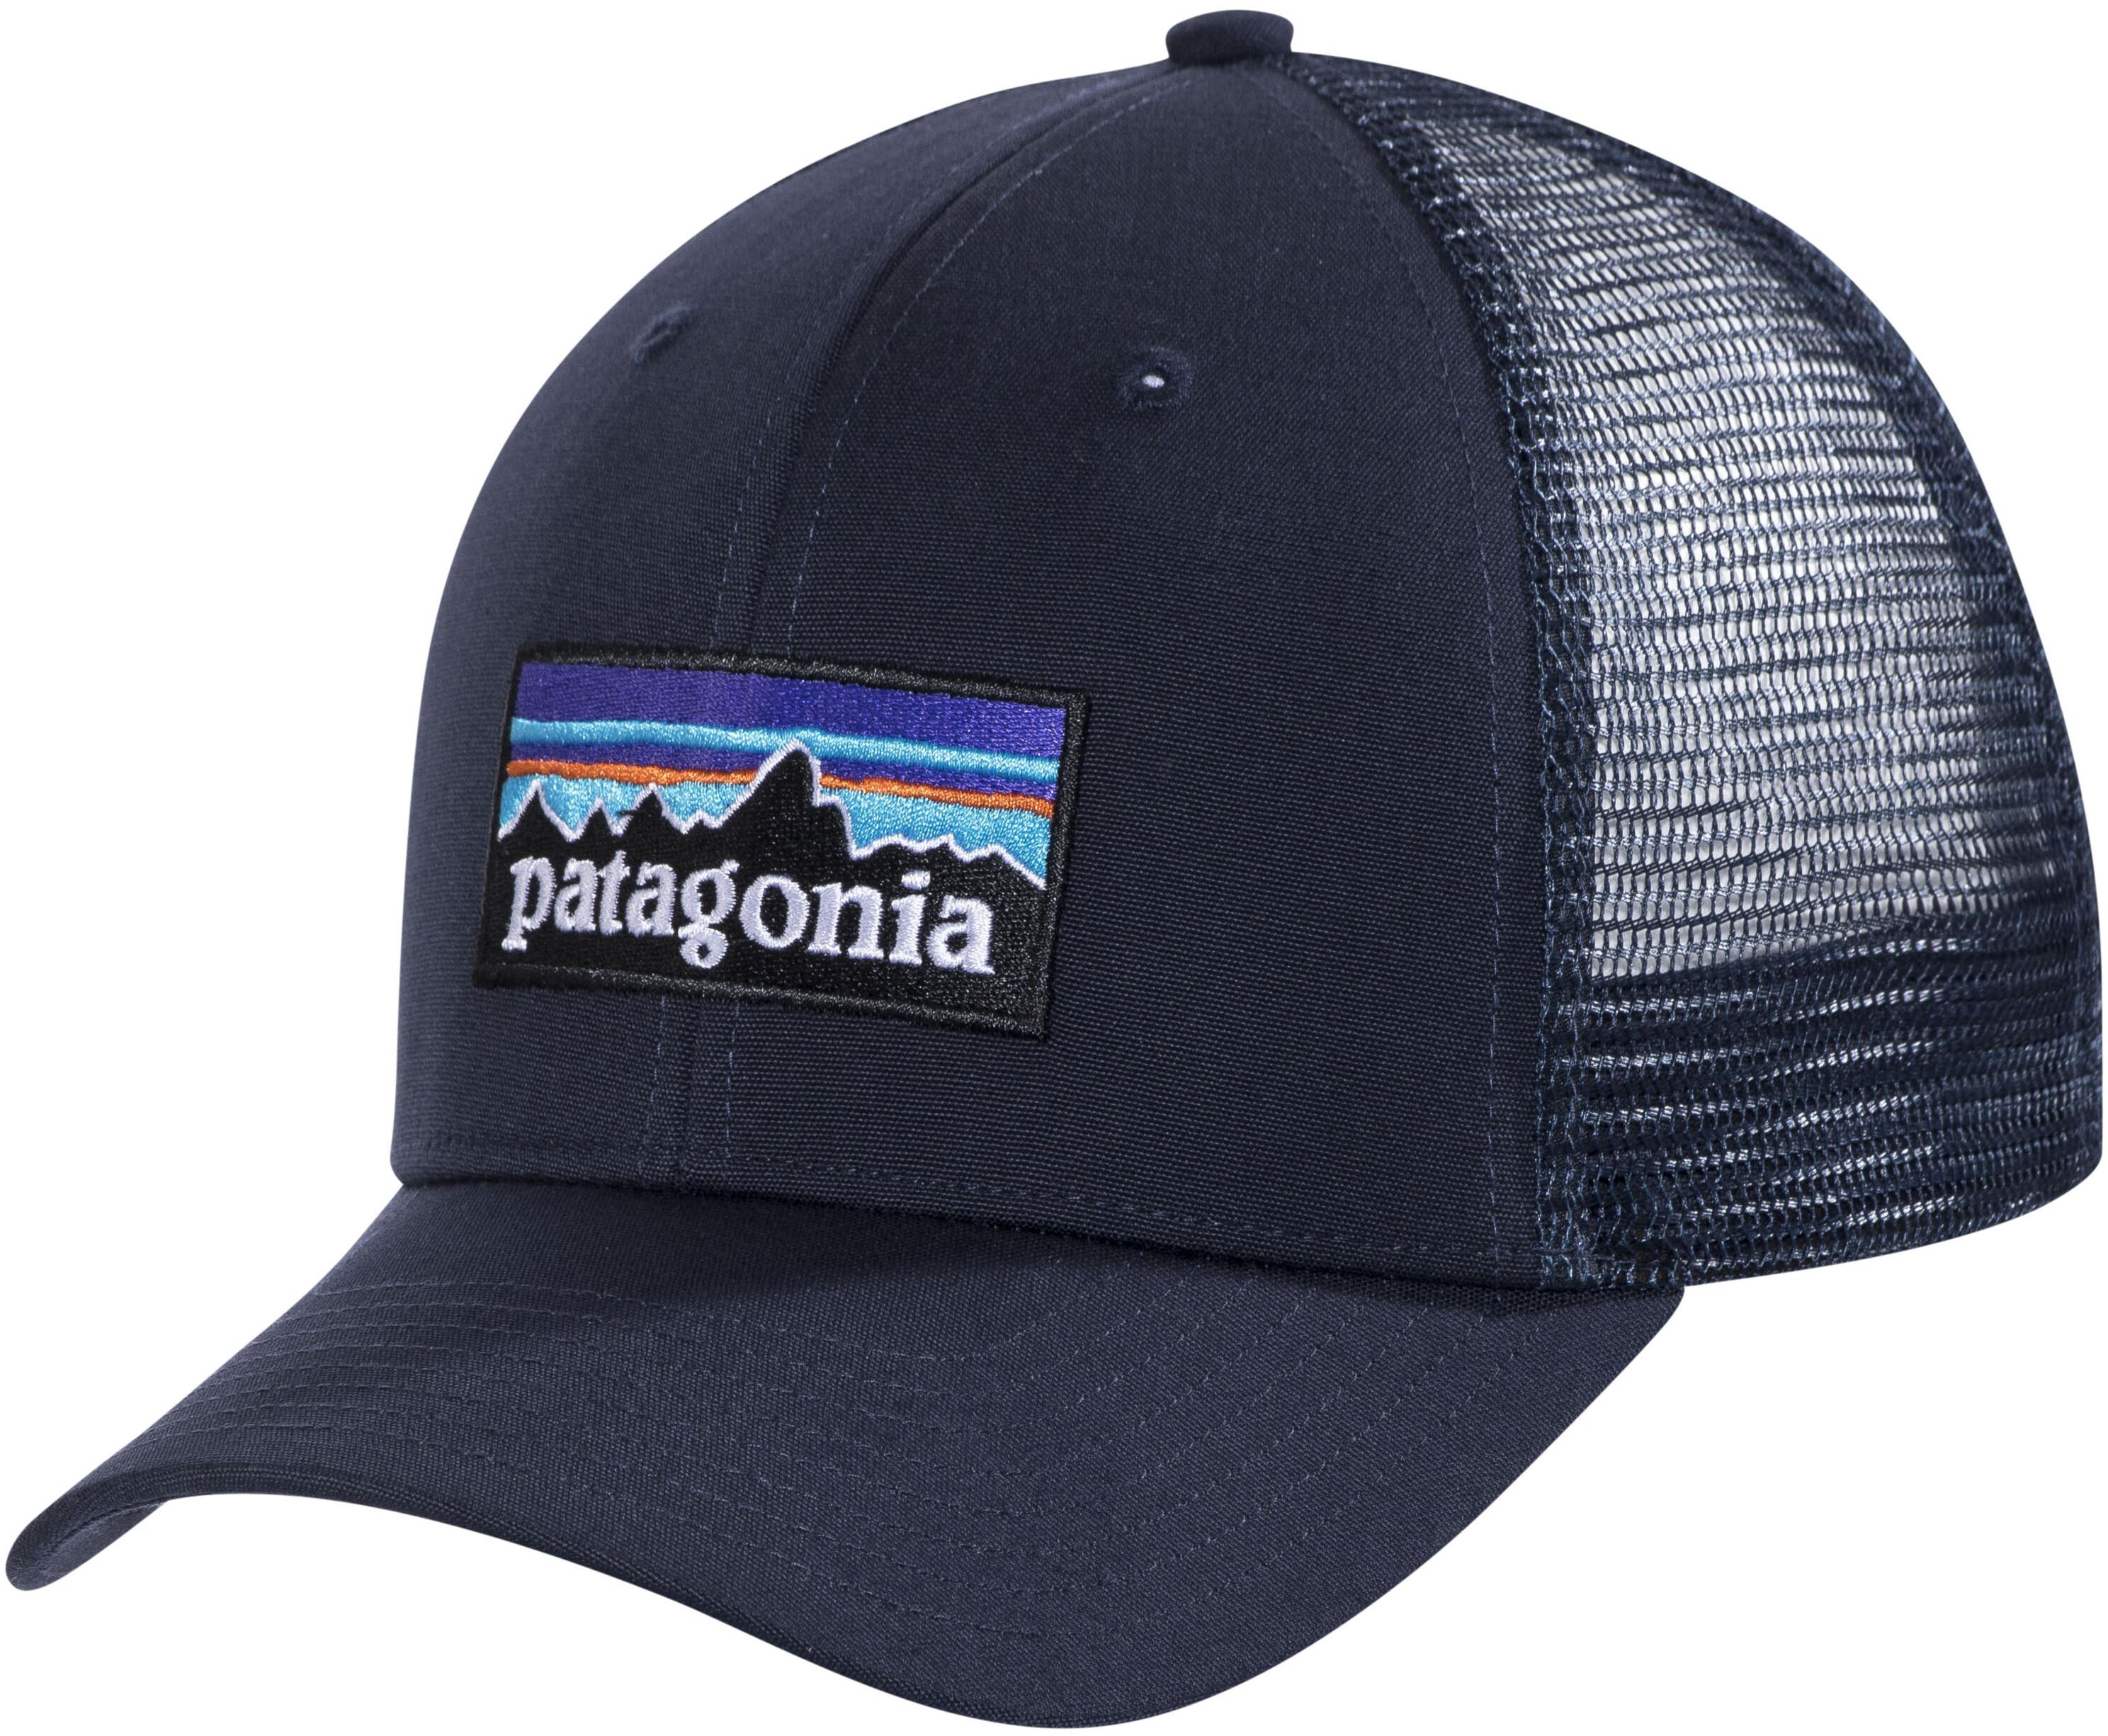 Patagonia P-6 Logo Trucker Hat Navy Blue - addnature.com d206835c9aa7